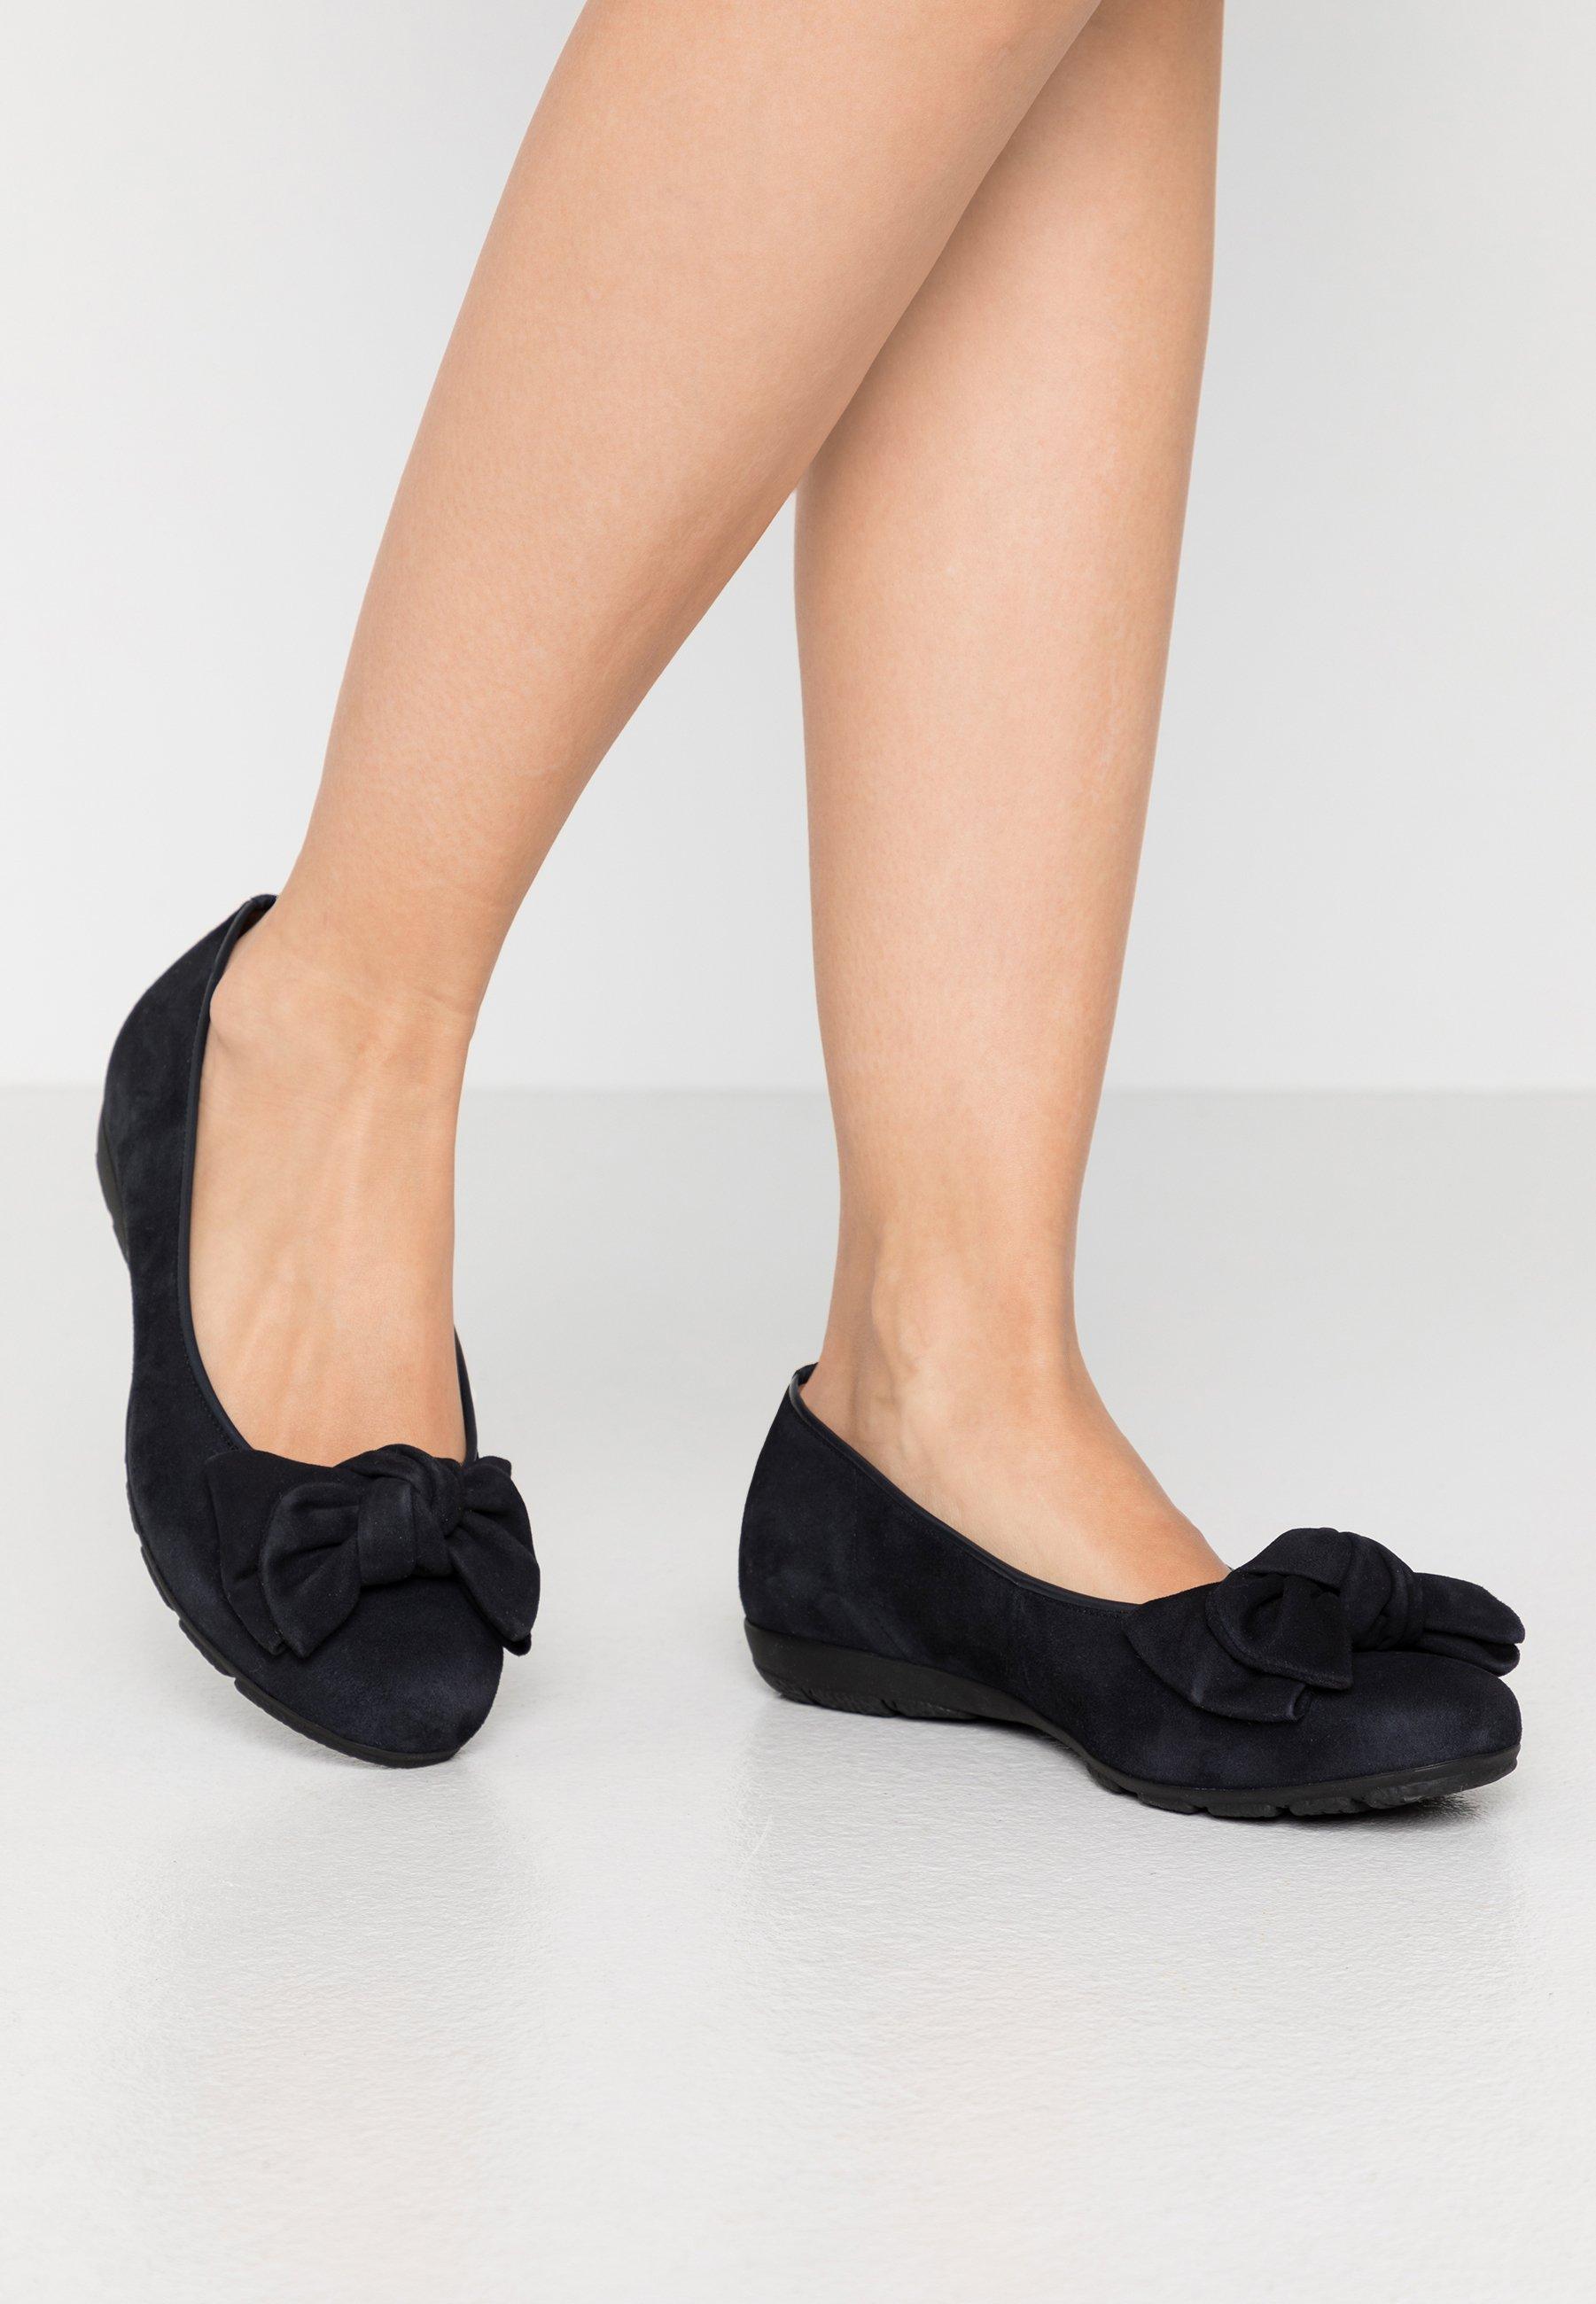 Gabor Ballerine - pazifik - Scarpe da donna Super